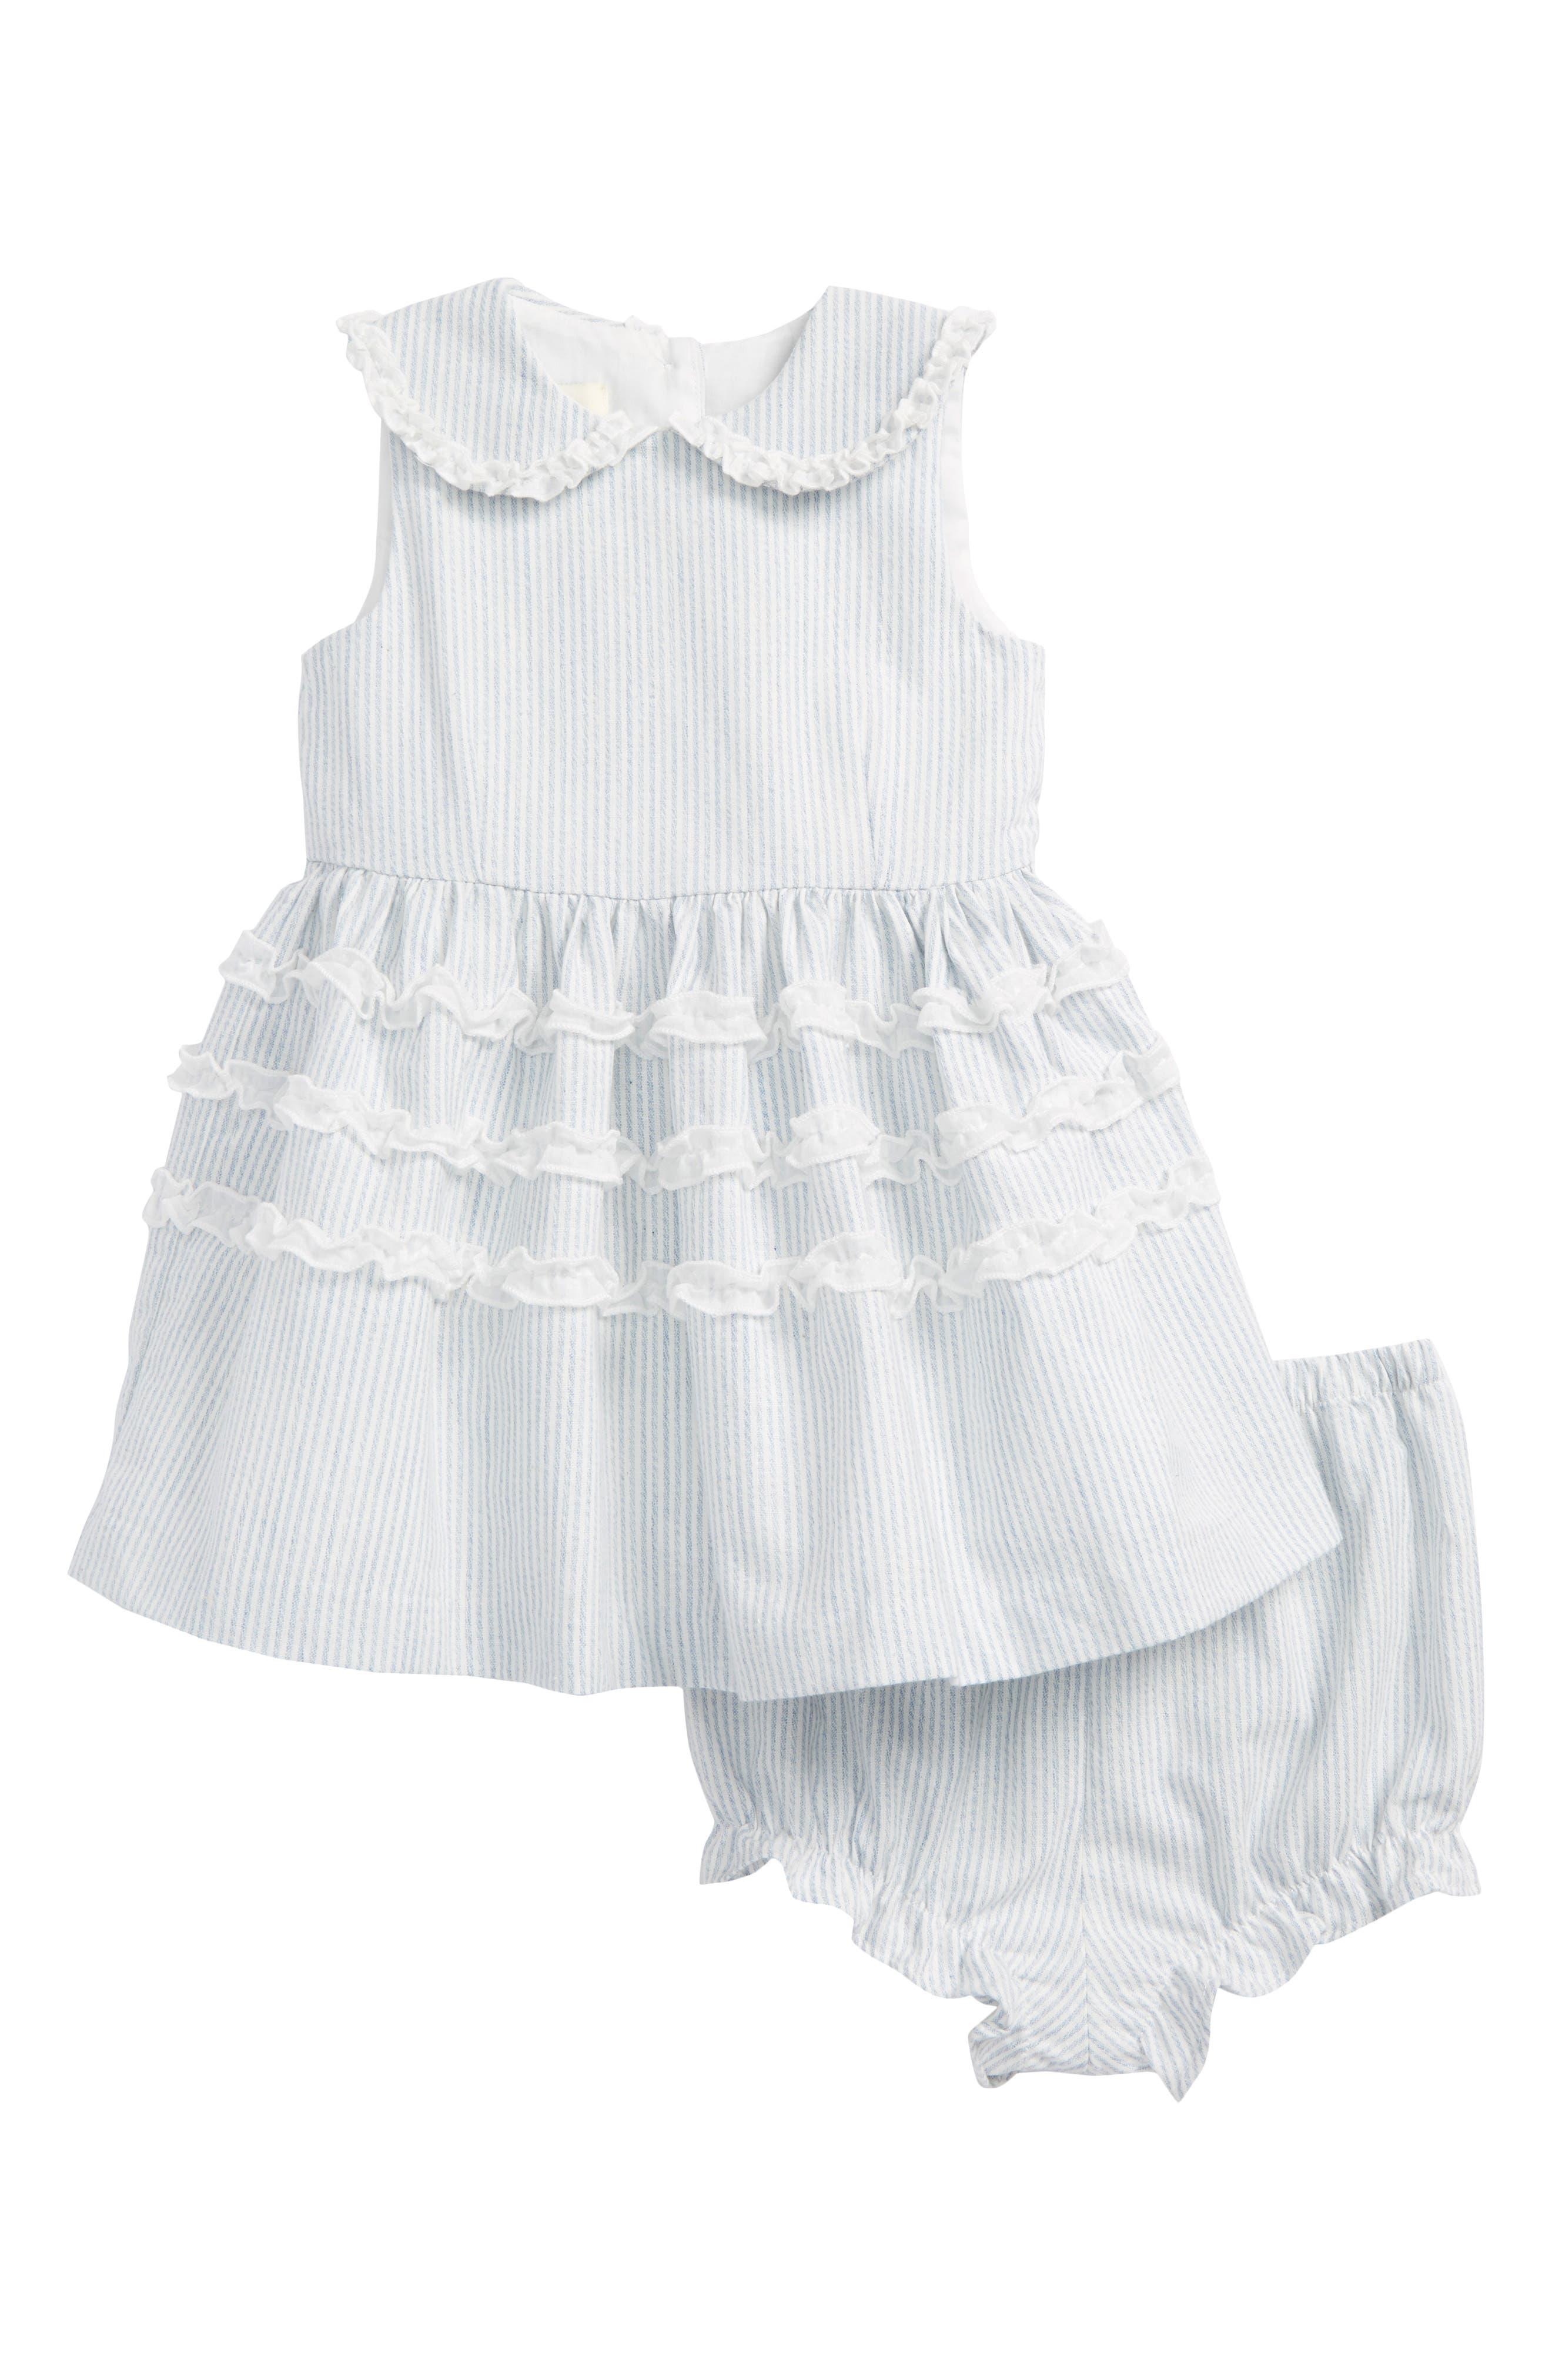 Main Image - Pippa & Julie Peter Pan Collar Ruffle Dress (Baby Girls)